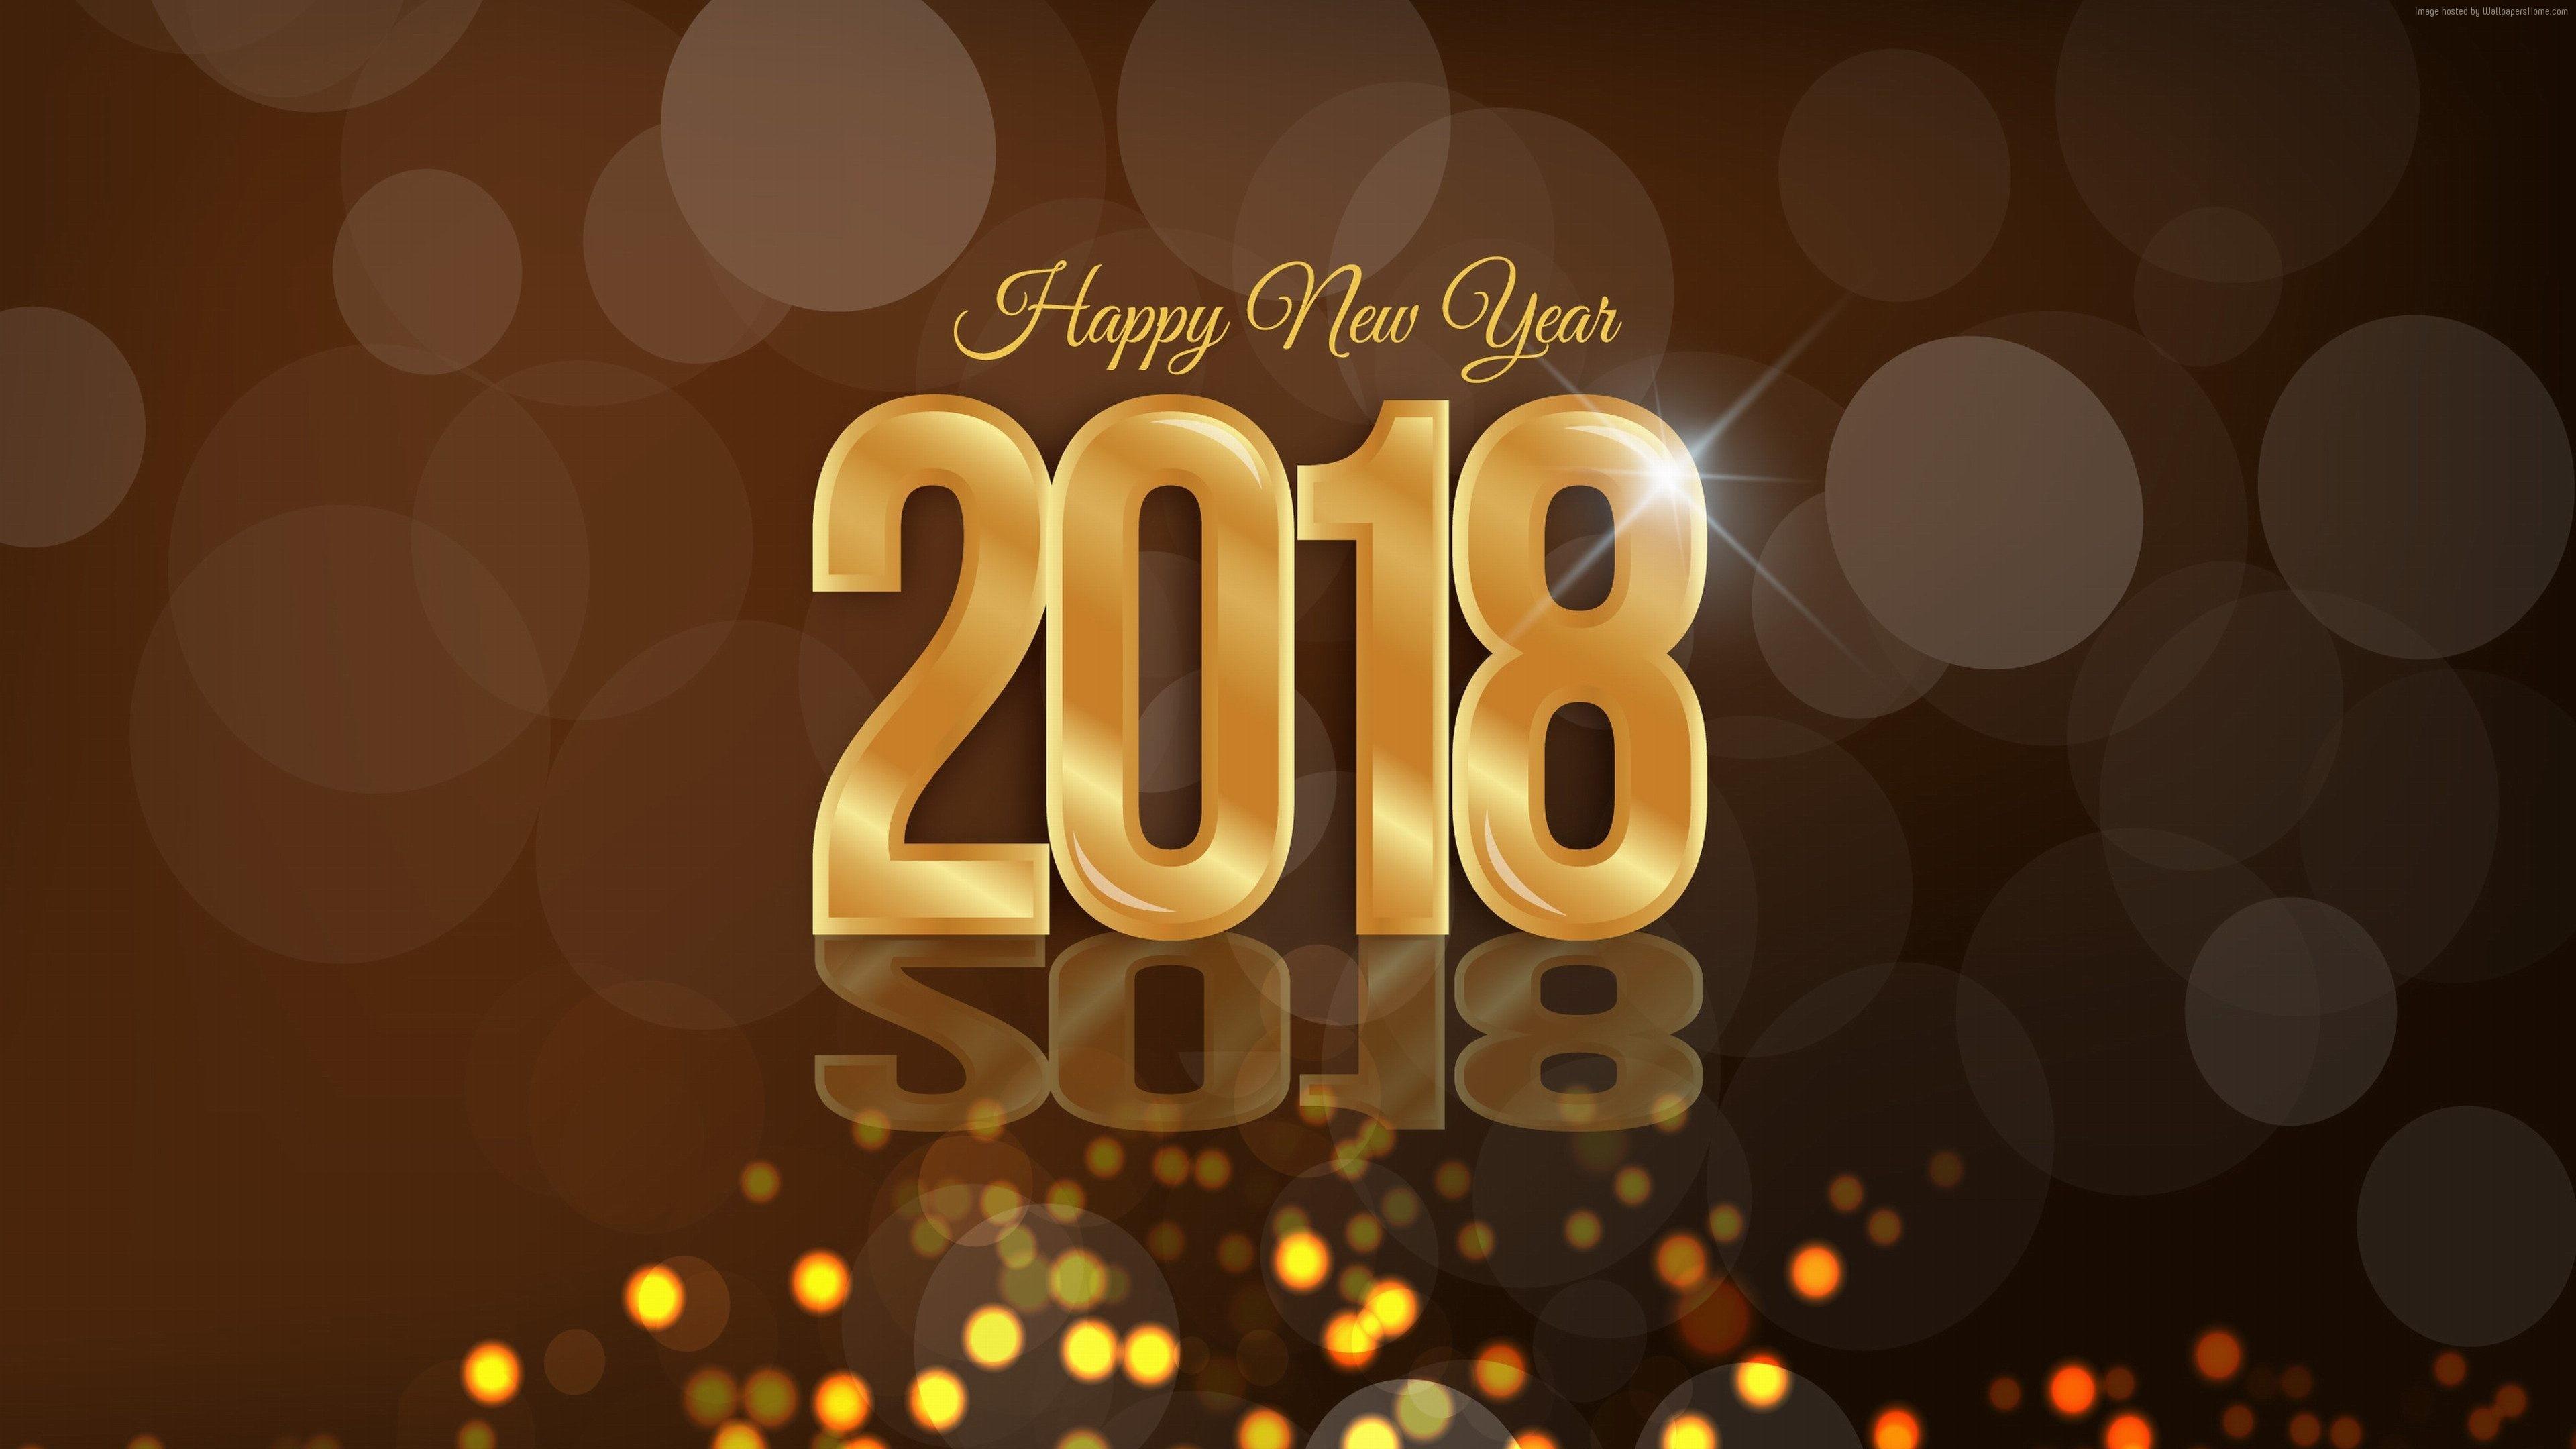 Wallpaper Christmas New Year 2018 4k Holidays 2018 4k